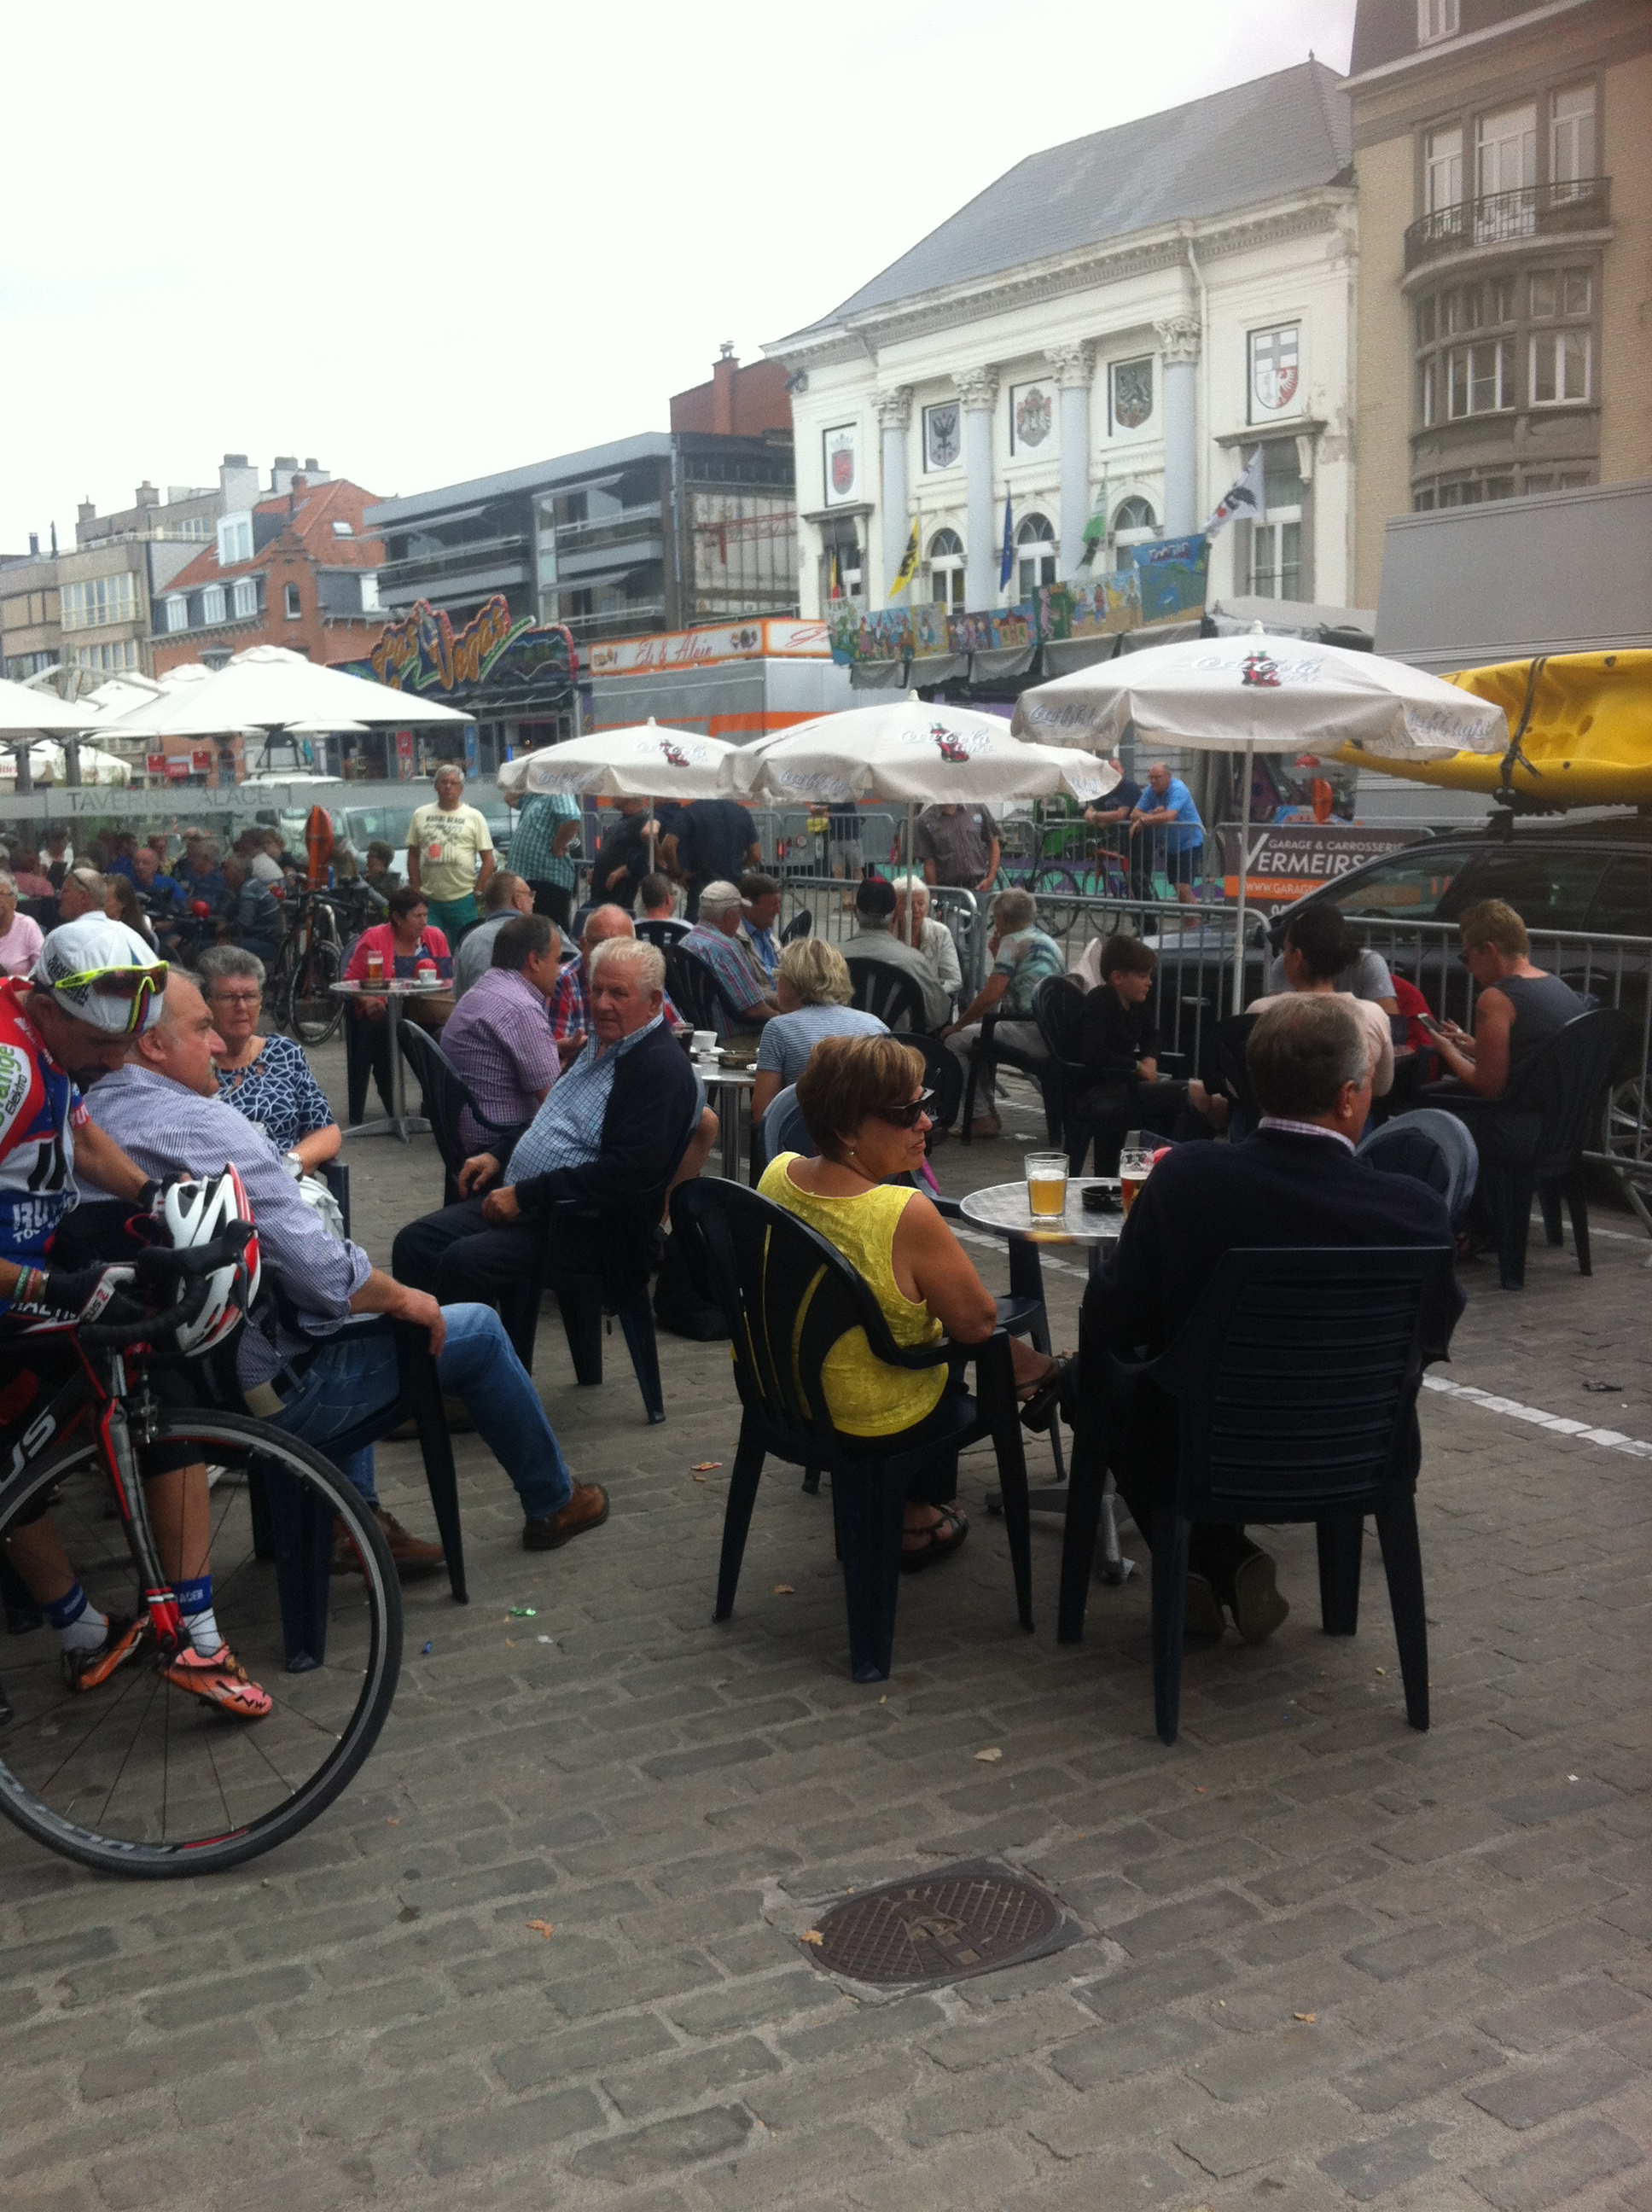 Deinze Kermis is about beer, some more beer and some tough Belgian kermis racing